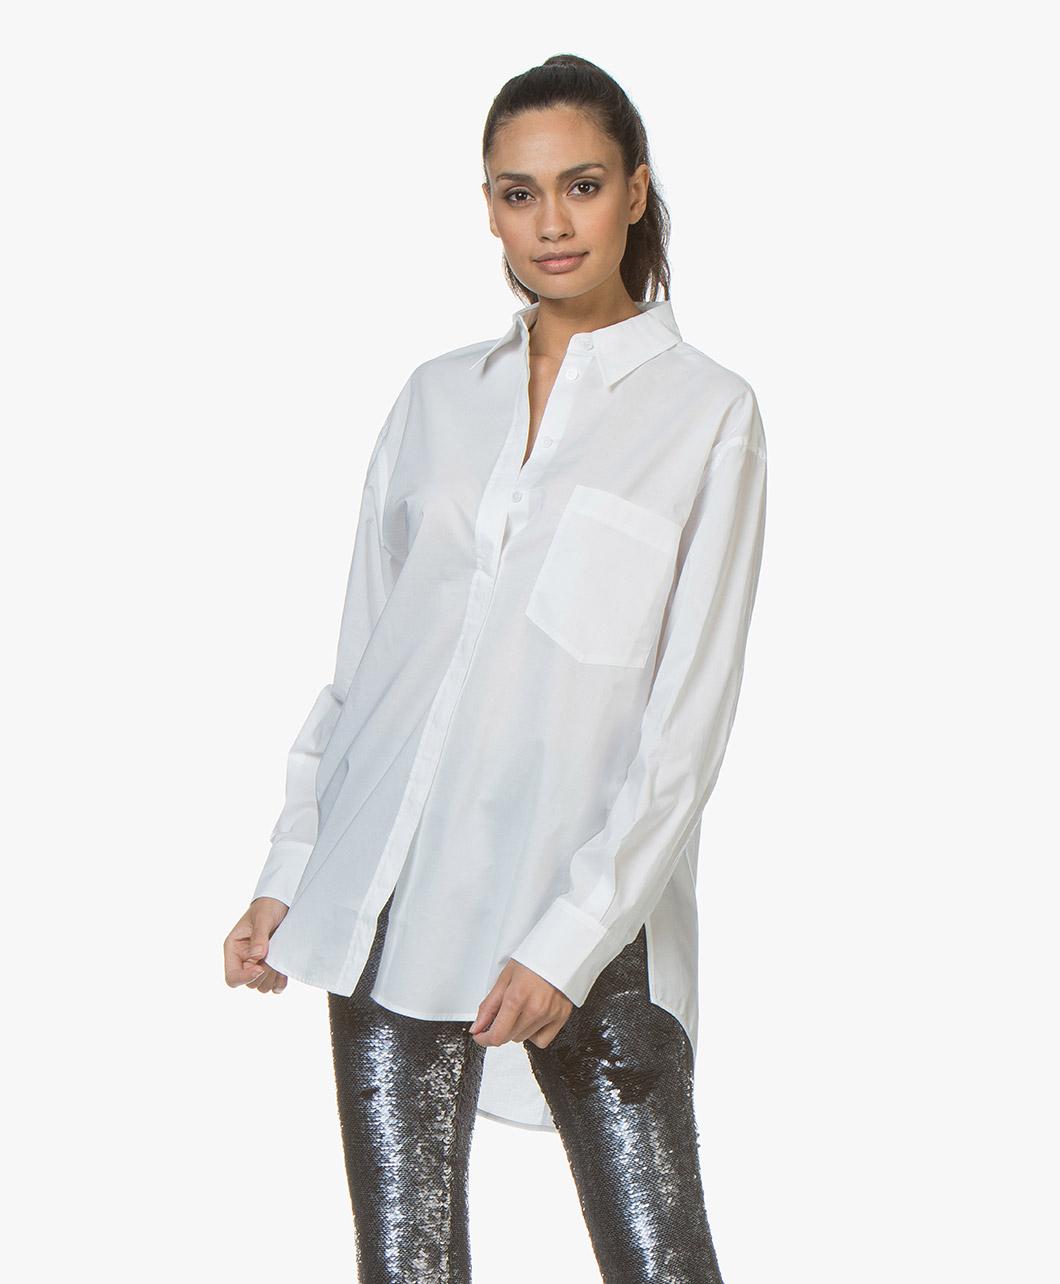 c596e9e2106 Classic Ladies White Cotton Shirt